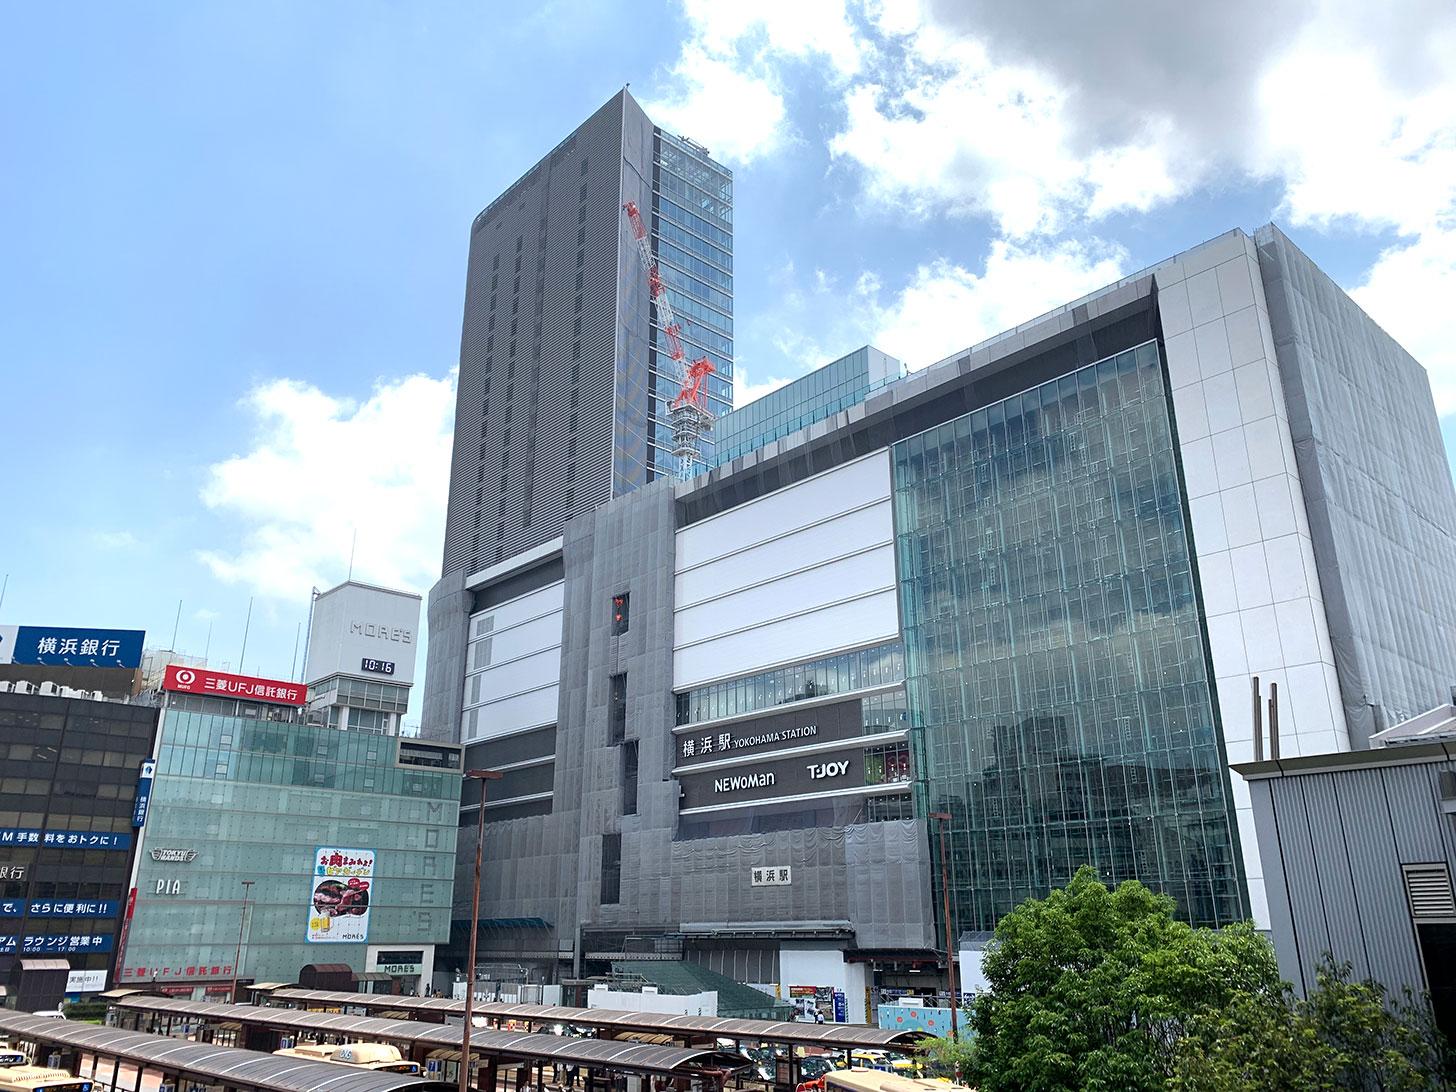 2019年6月 横浜駅西口の様子